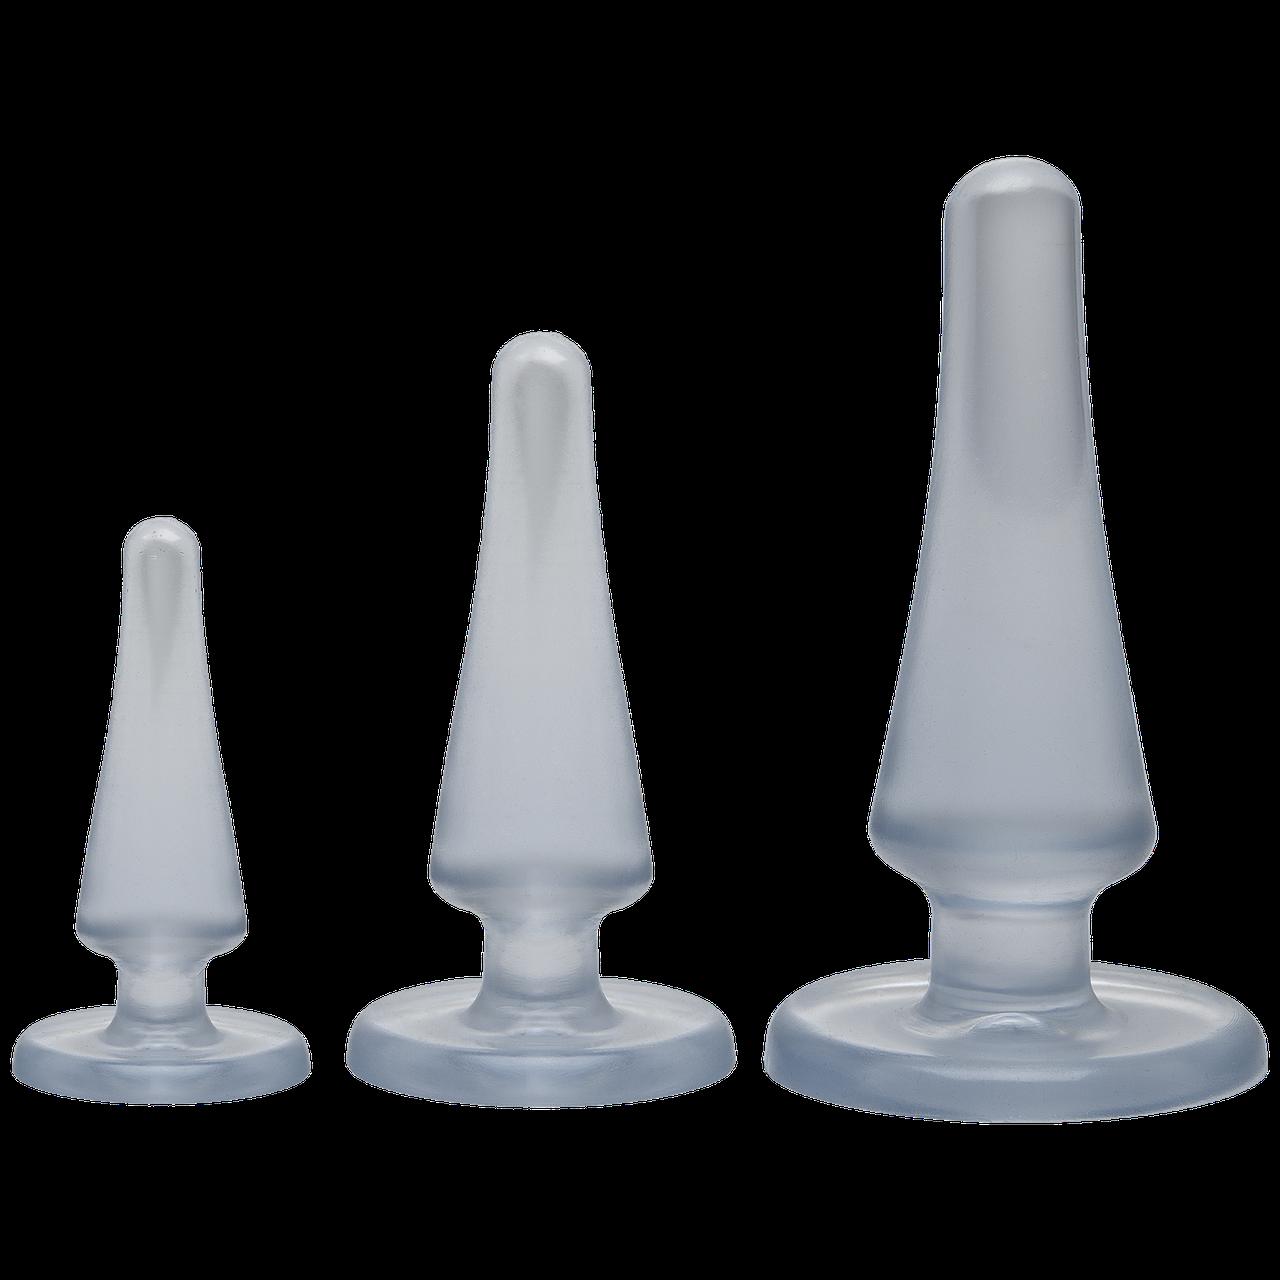 Набір анальних пробок Doc Johnson Crystal Jellies Anal - Clear, макс. діаметр 2см - 3см - 4см     18+